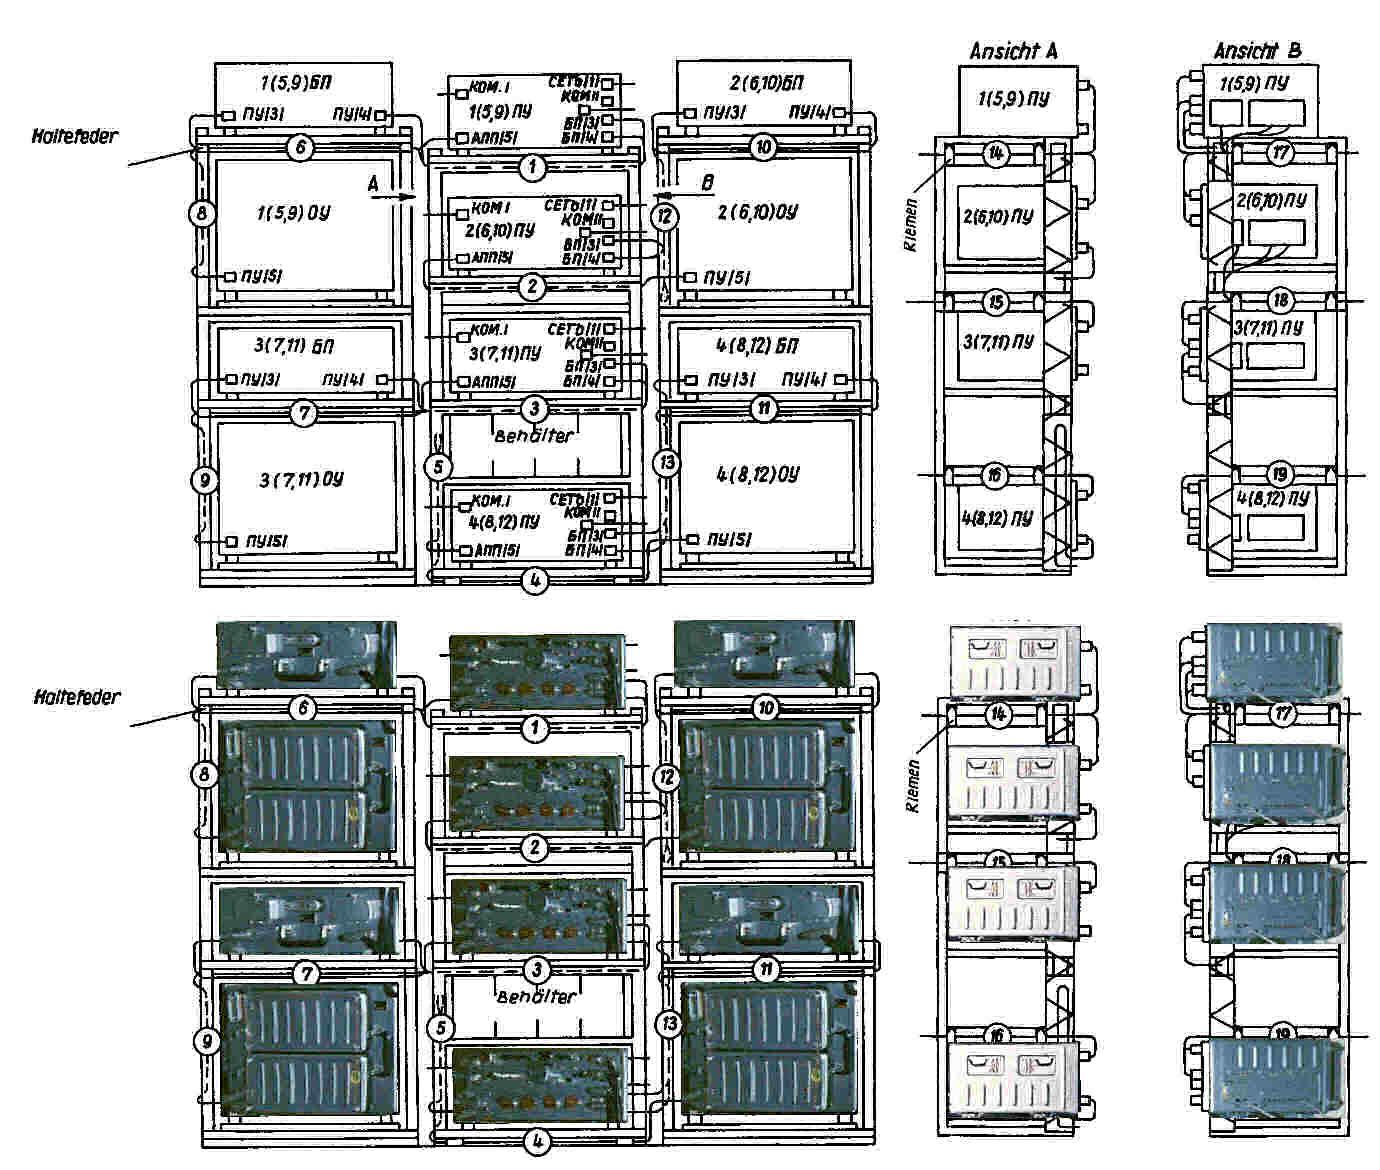 P-236 TK, P-240 TN, P-244 TN - SAS-Trupps